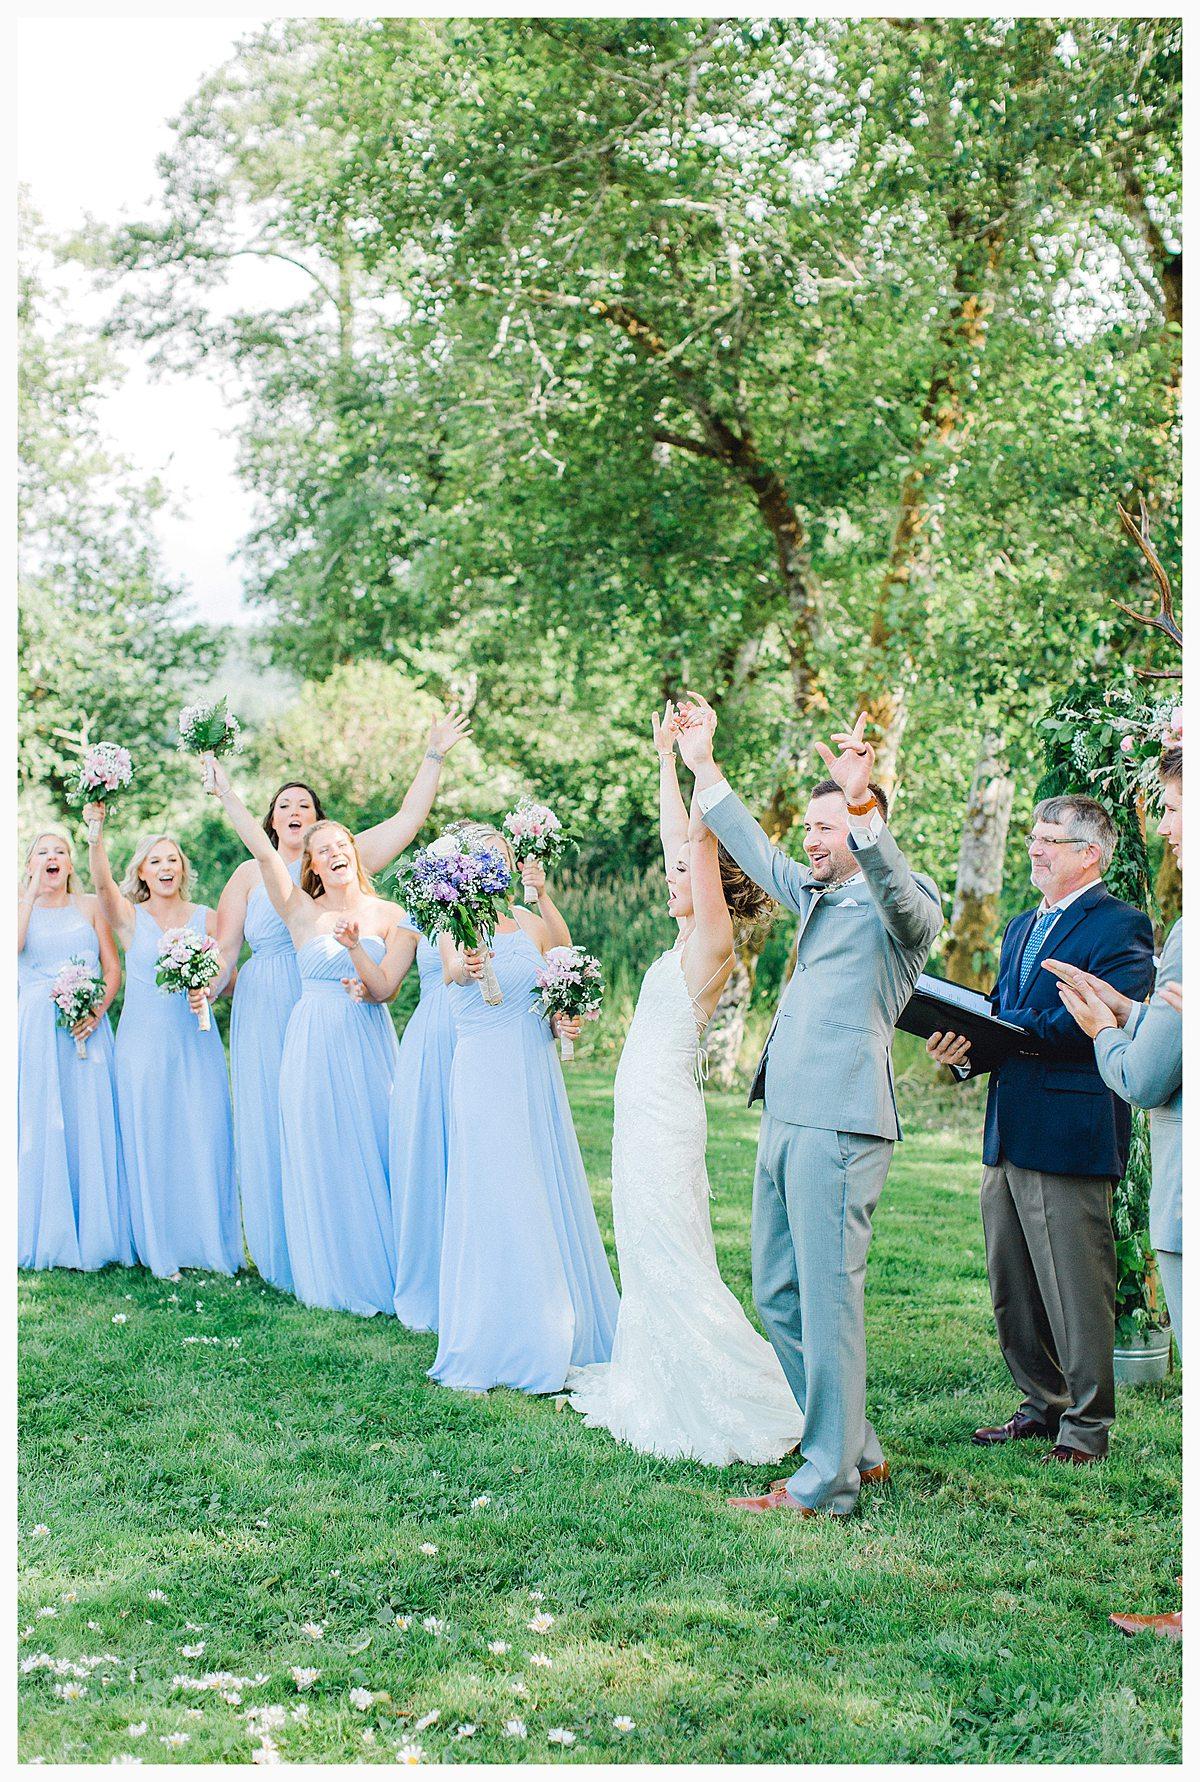 Rustic Coastal Blue Wedding in Southwest Washington, Emma Rose Company, Seattle and Portland Wedding Photographer, Light and Airy_0125.jpg